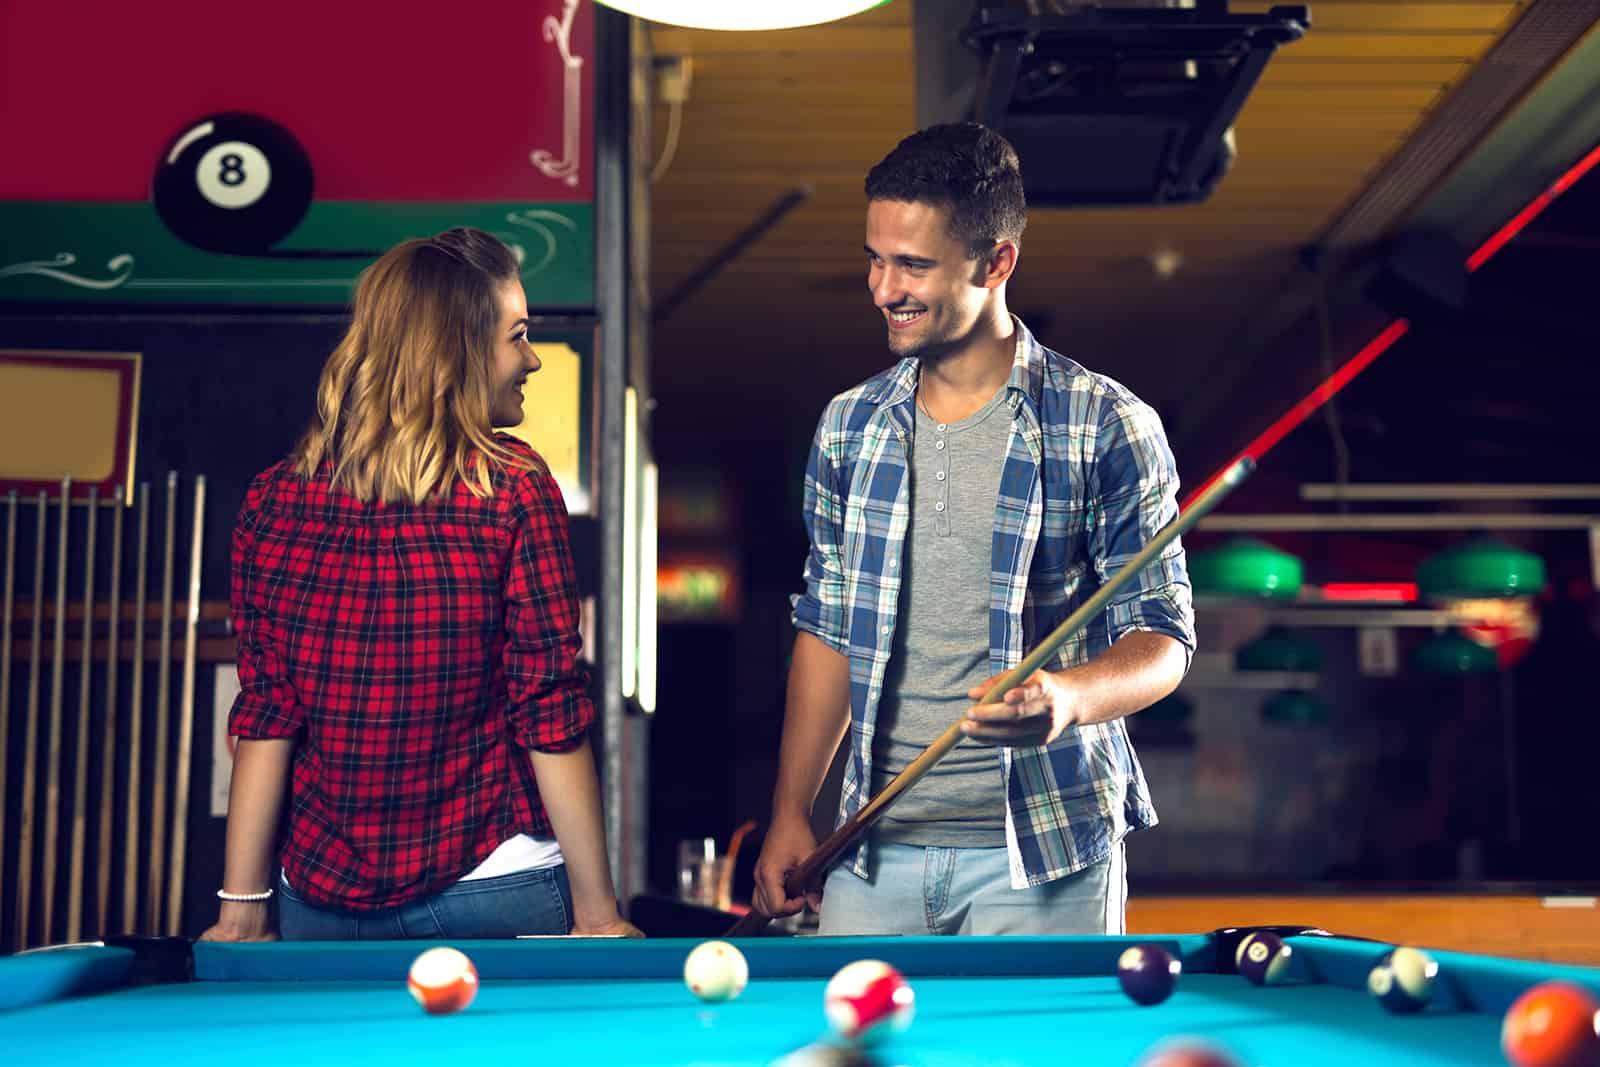 un homme flirter avec une femme et jouer au billard dans la salle de billard